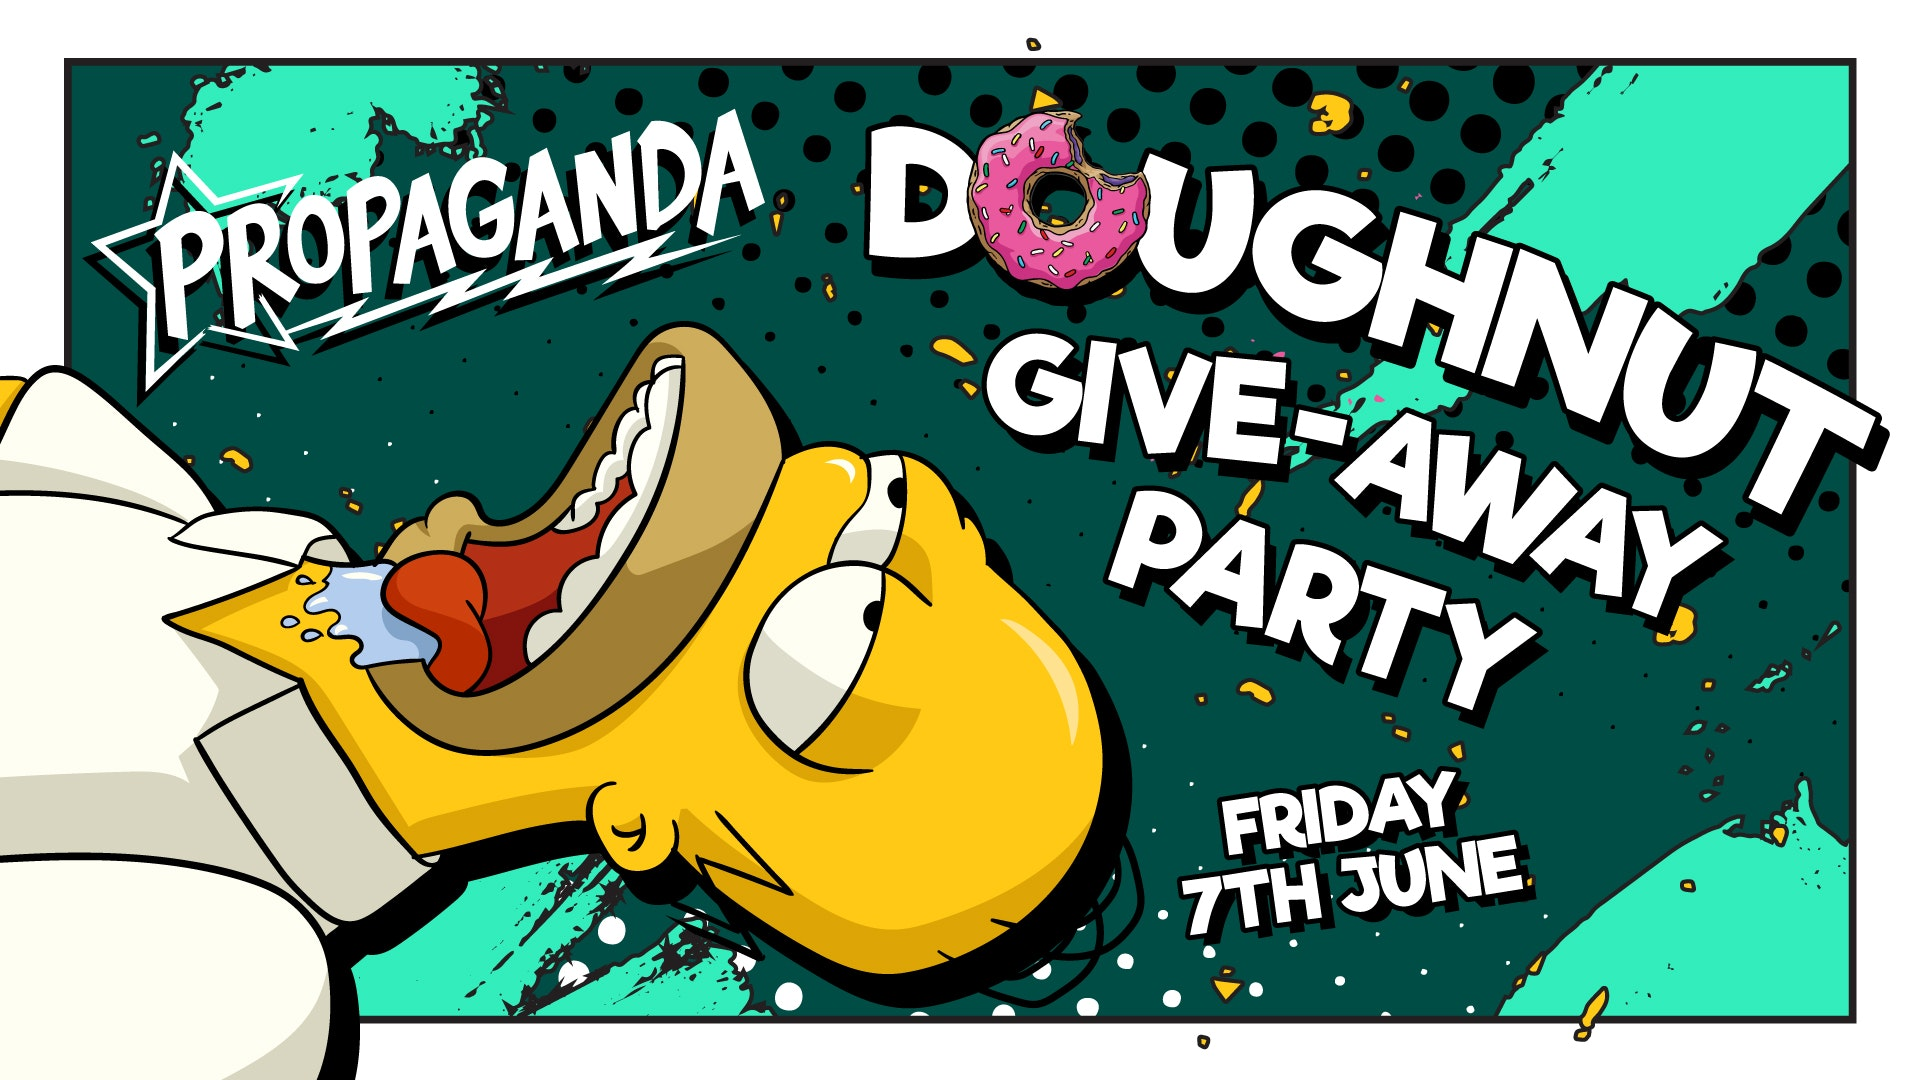 Propaganda Edinburgh – Doughnut Party